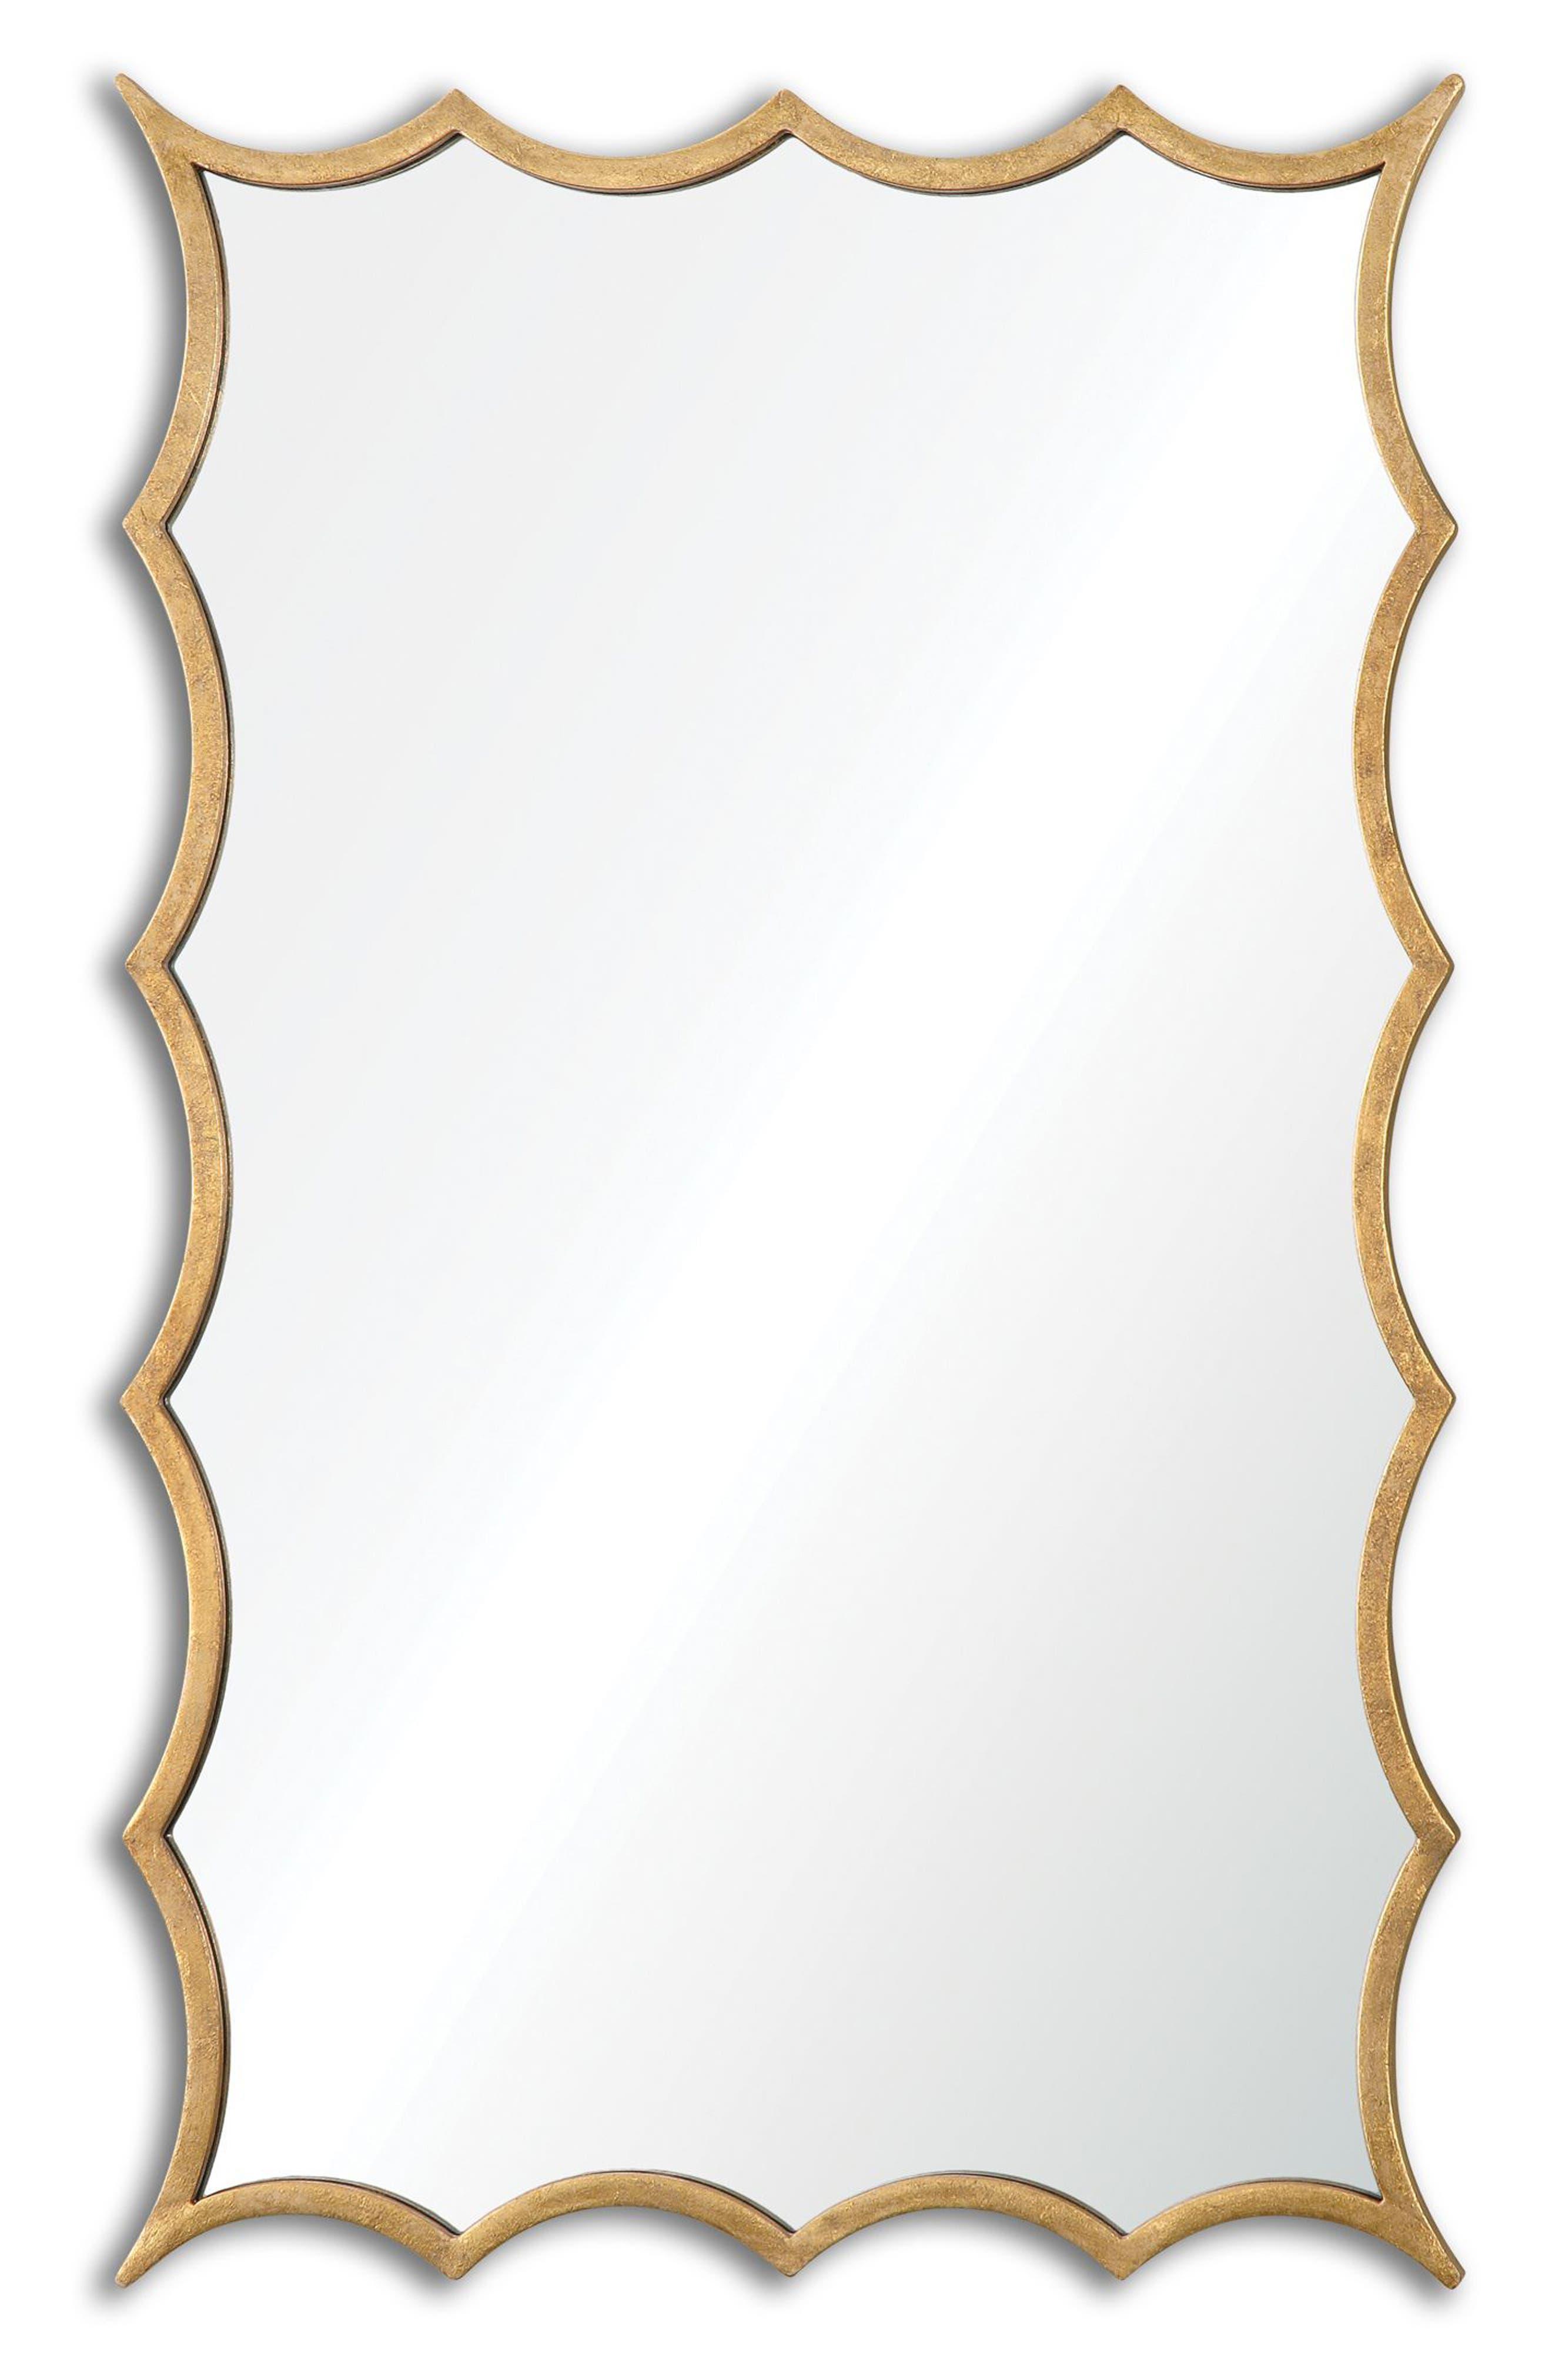 Main Image - Uttermost Dareios Wall Mirror